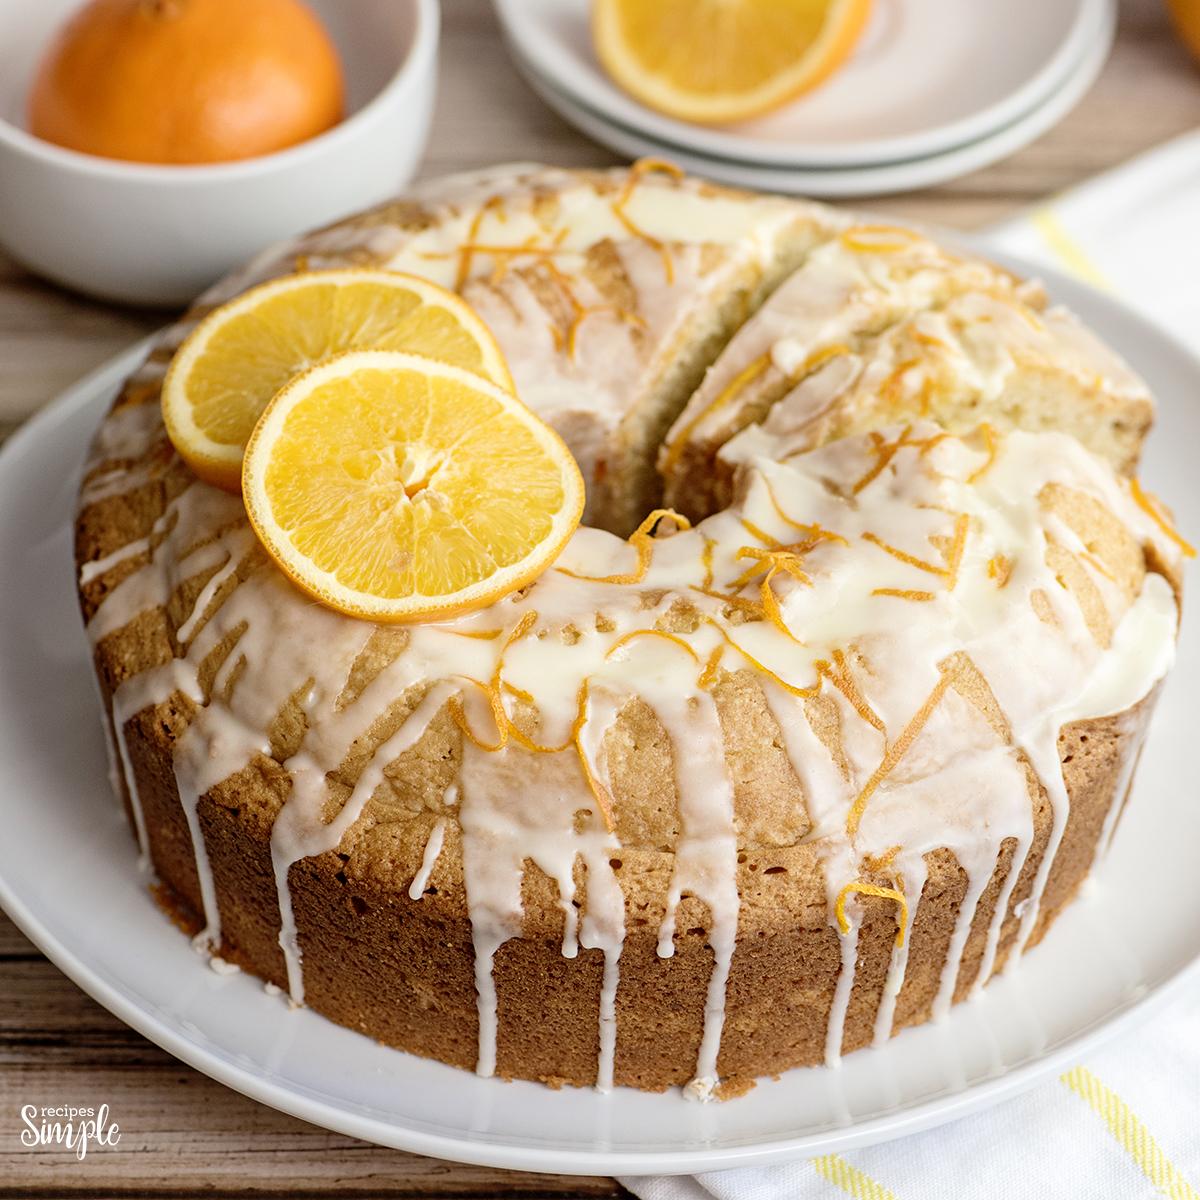 Glazed Orange Bundt Cake on white plate